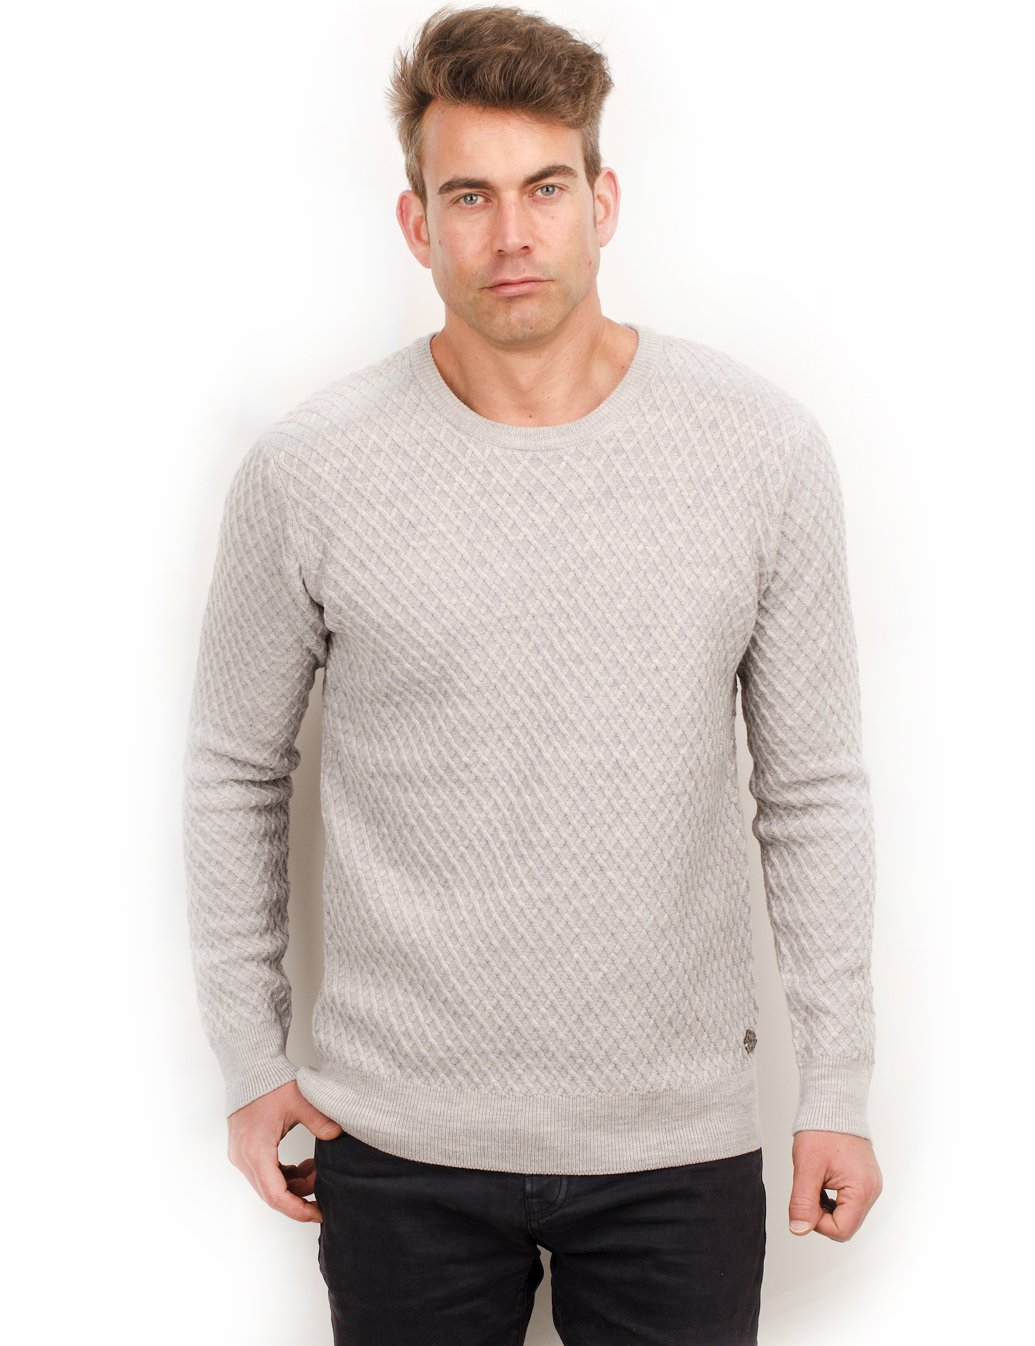 Scotch & Soda Fine Cable Knit Pullover, Grey (2XL)